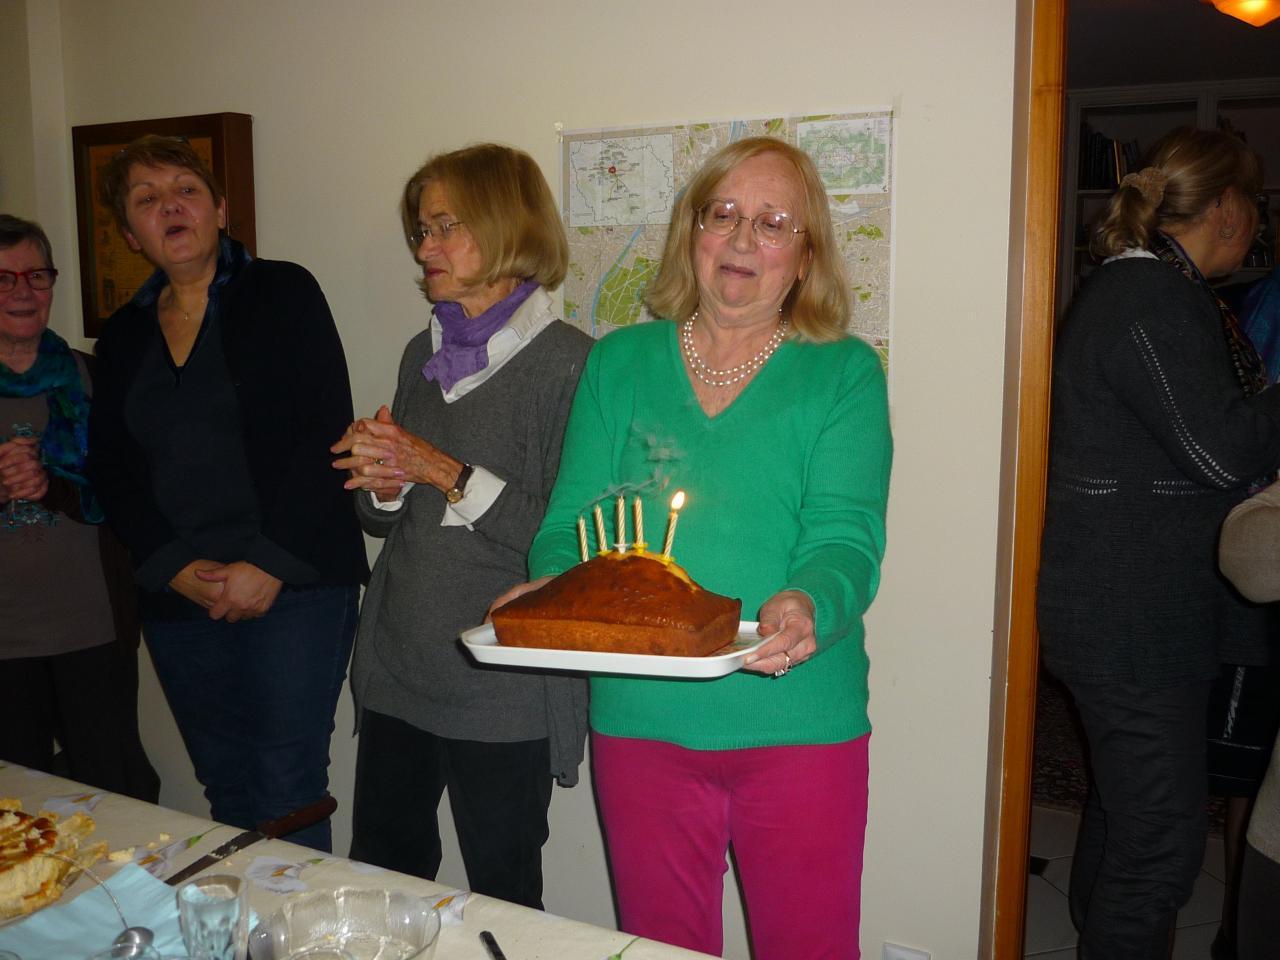 L'anniversaire de Nicole